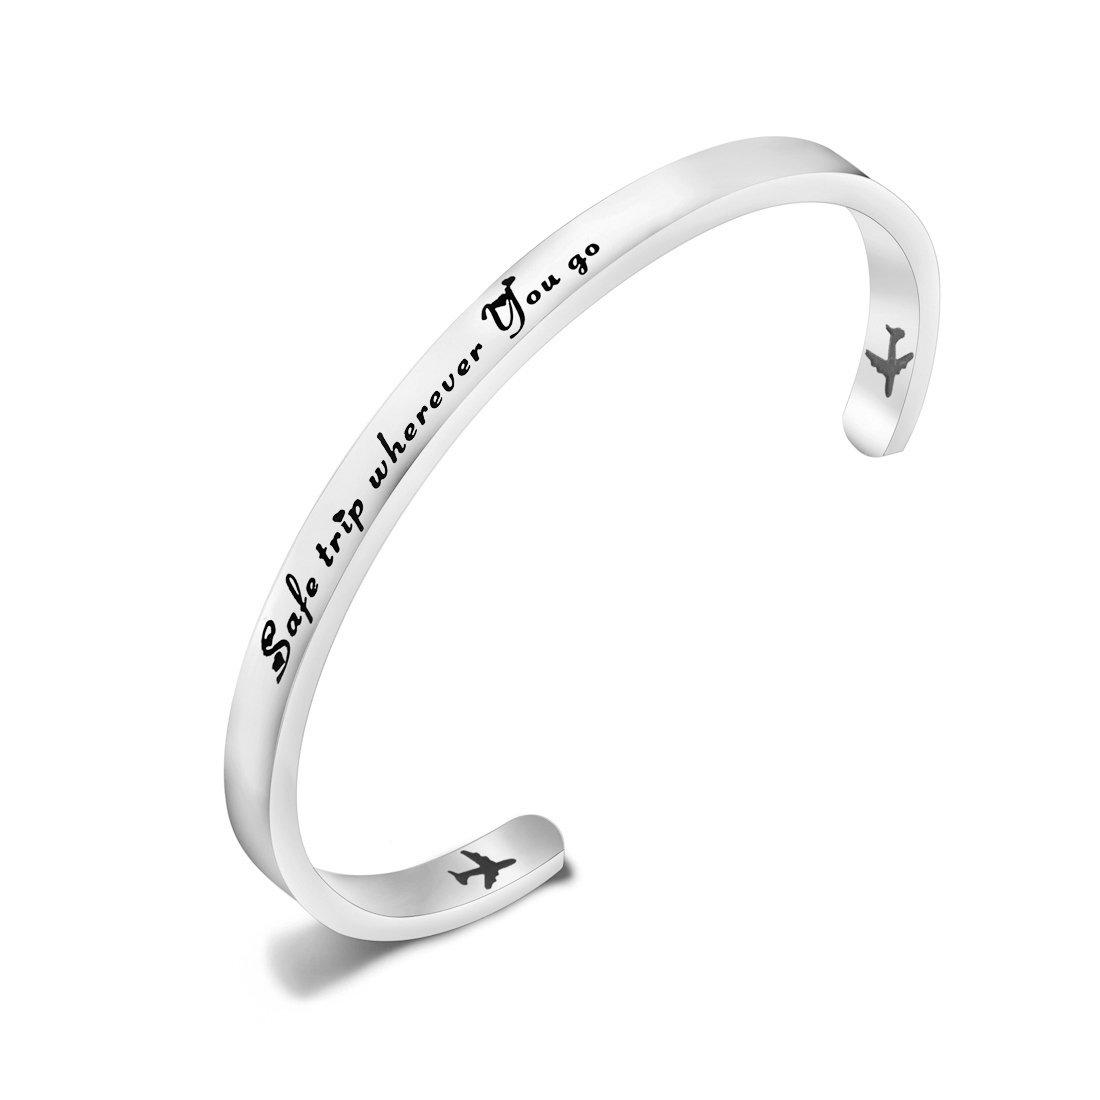 ENSIANTH Safe Travels Bracelet Pilot Gift Airplane Cuff Bracelet Traveling Bracelet Aviation Jewelry Flight Attendant Gift (Sliver-5mm)